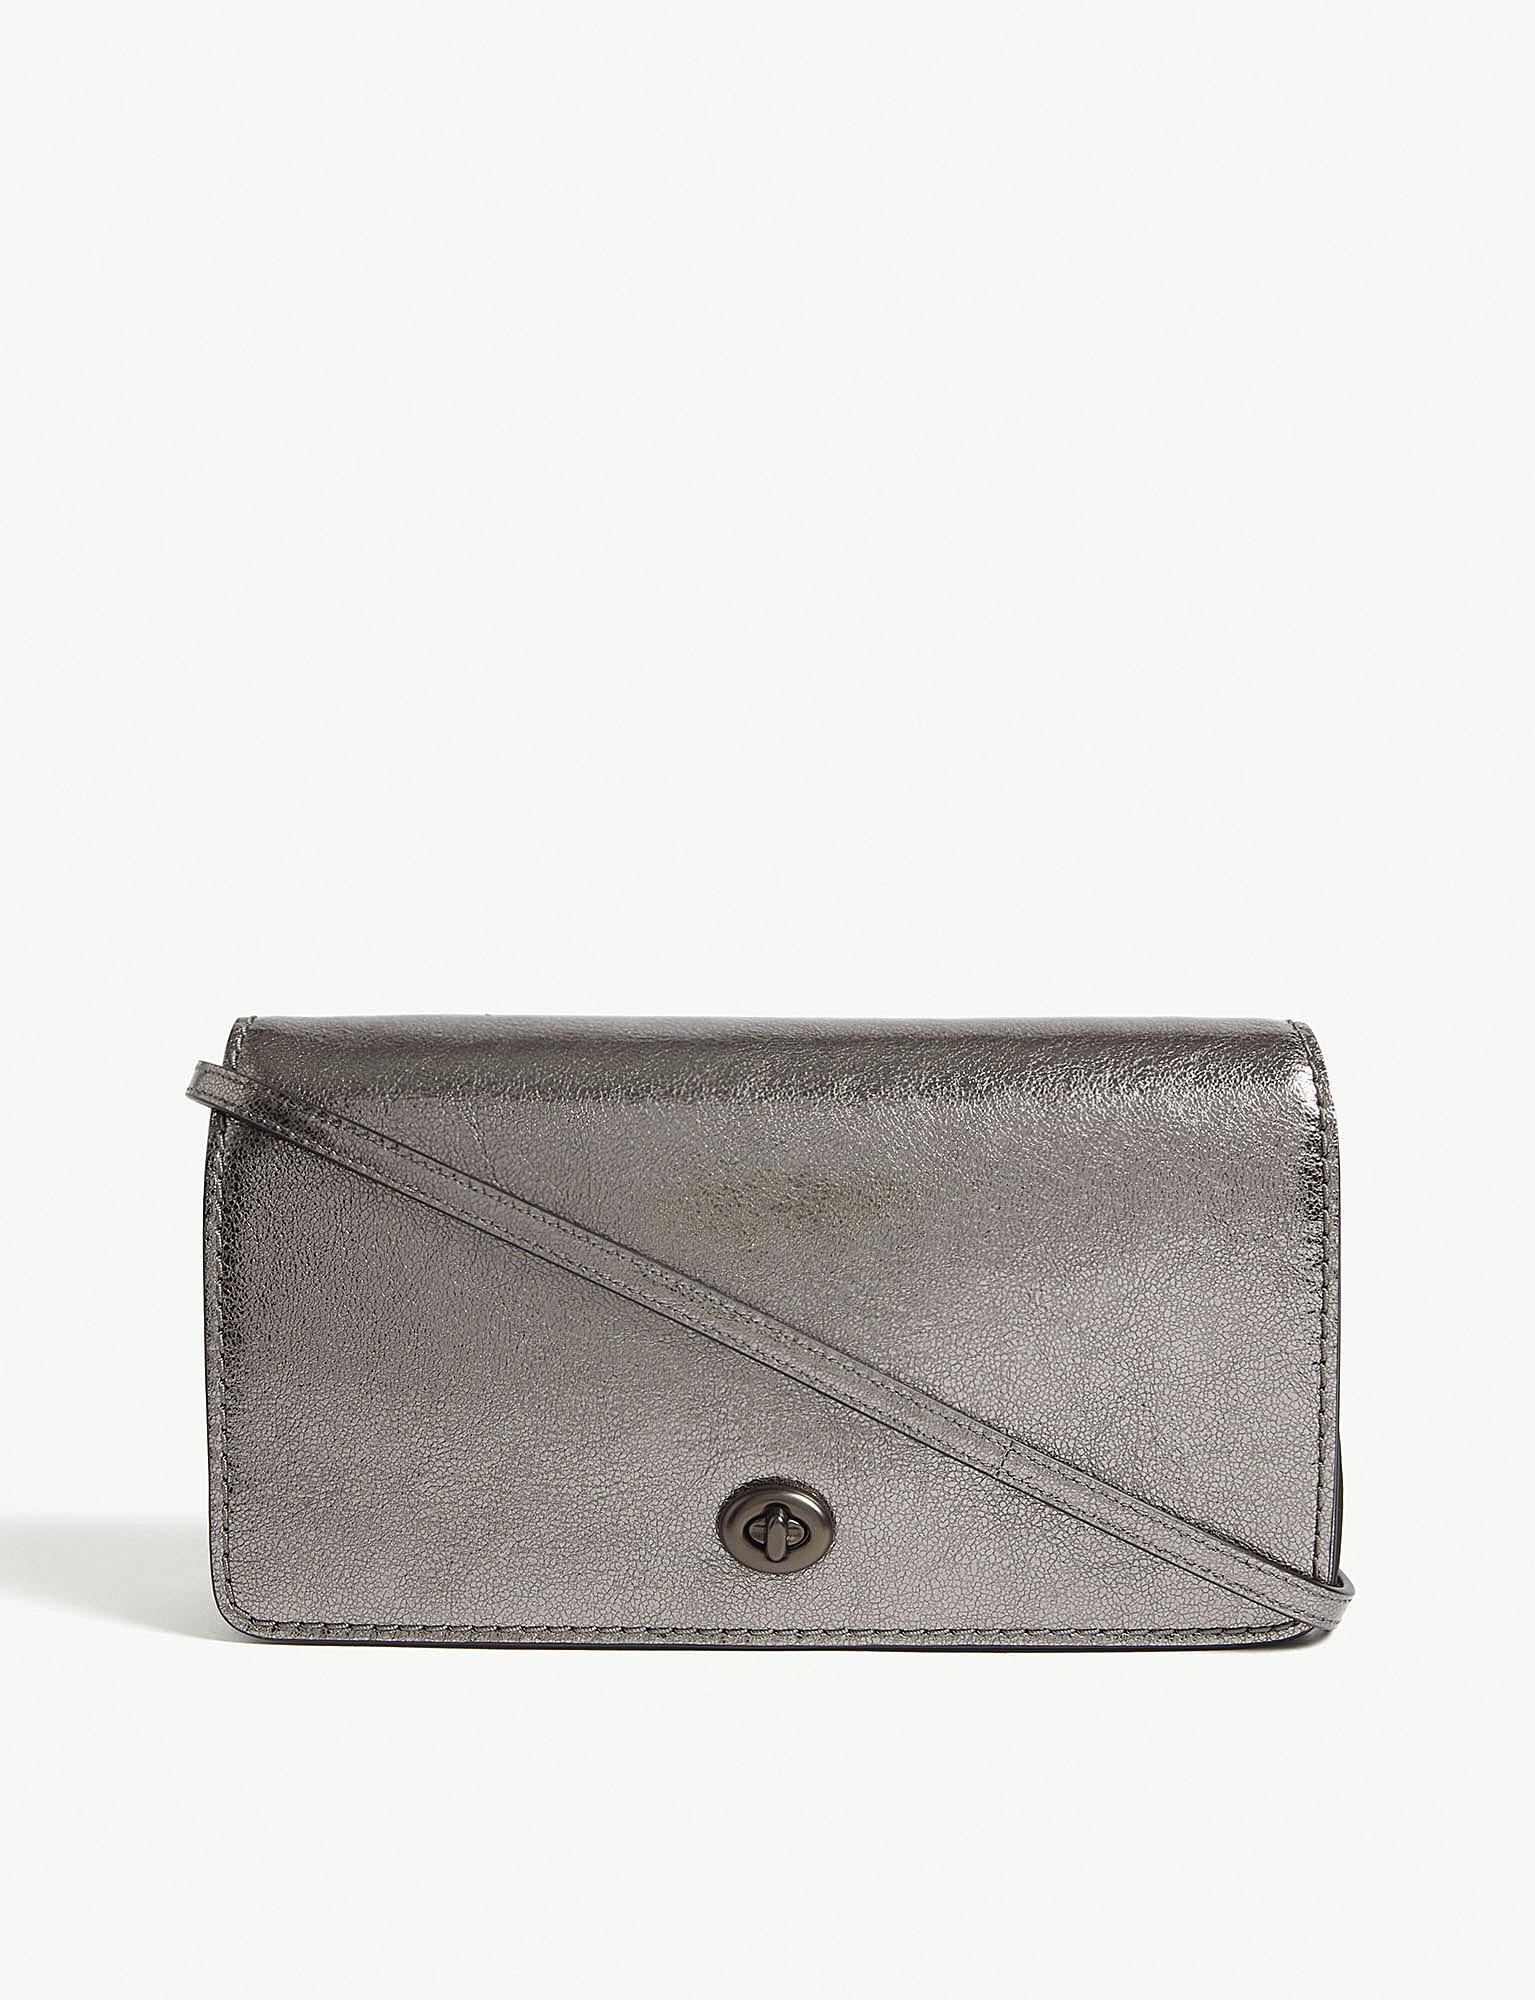 ff9bcdd90b7d1 Lyst - COACH Dinky Metallic Leather Cross-body Bag in Metallic